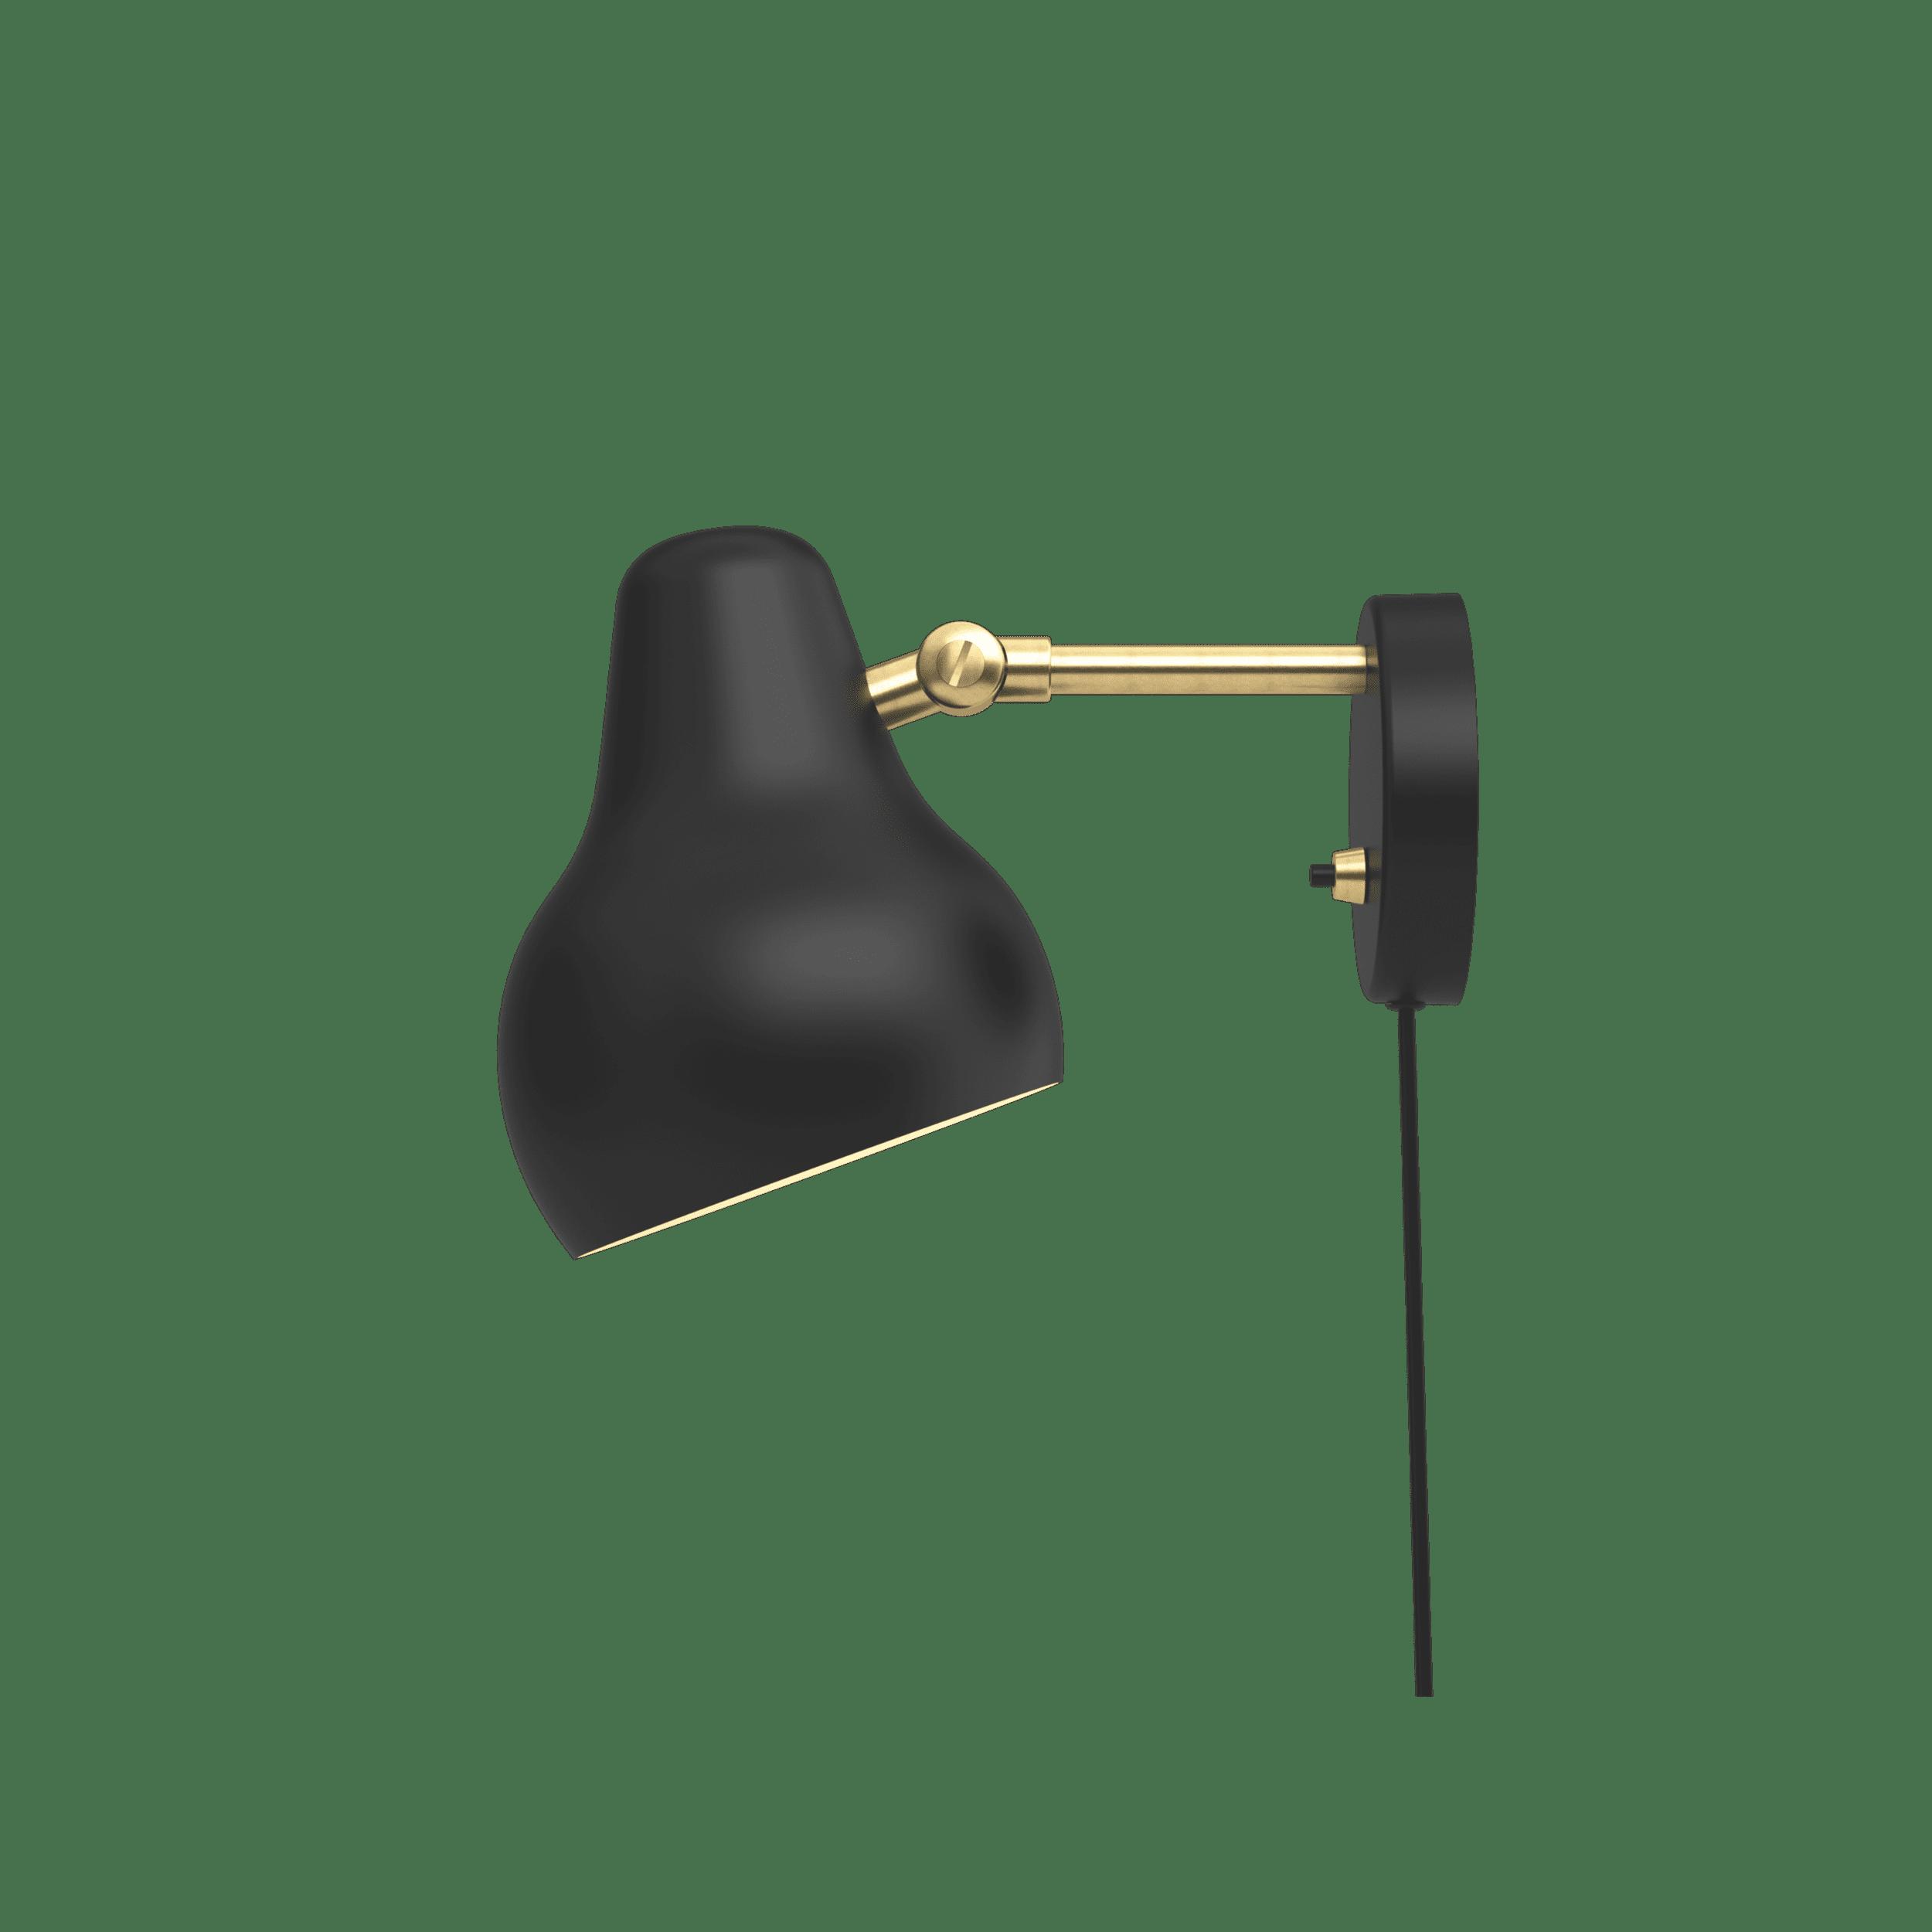 Væglampe VL38 louis poulsen vilhelm lauritzen indbo